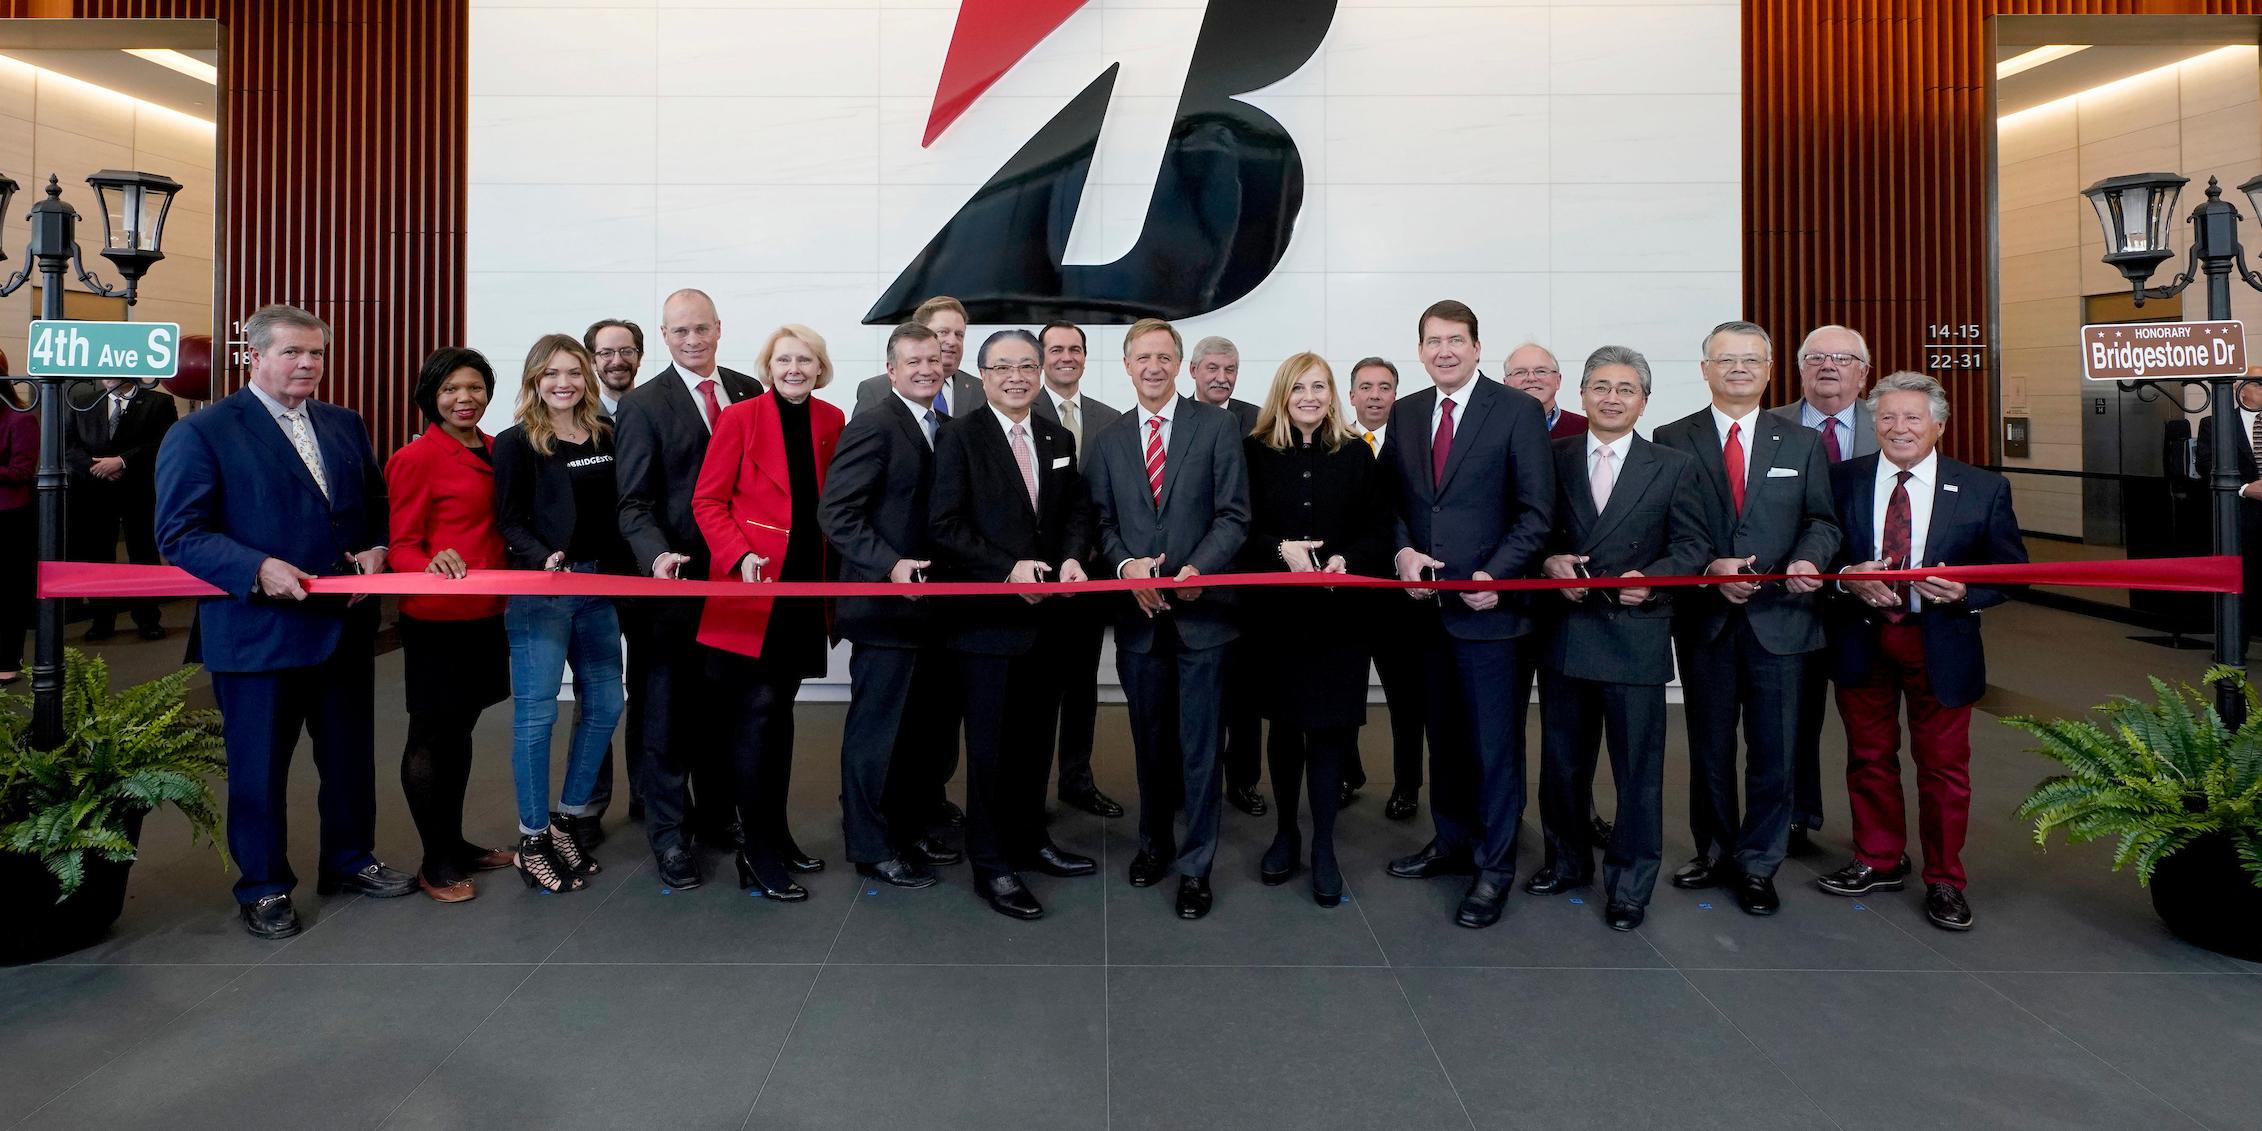 Bridgestone opens new headquarters in downtown Nashville.